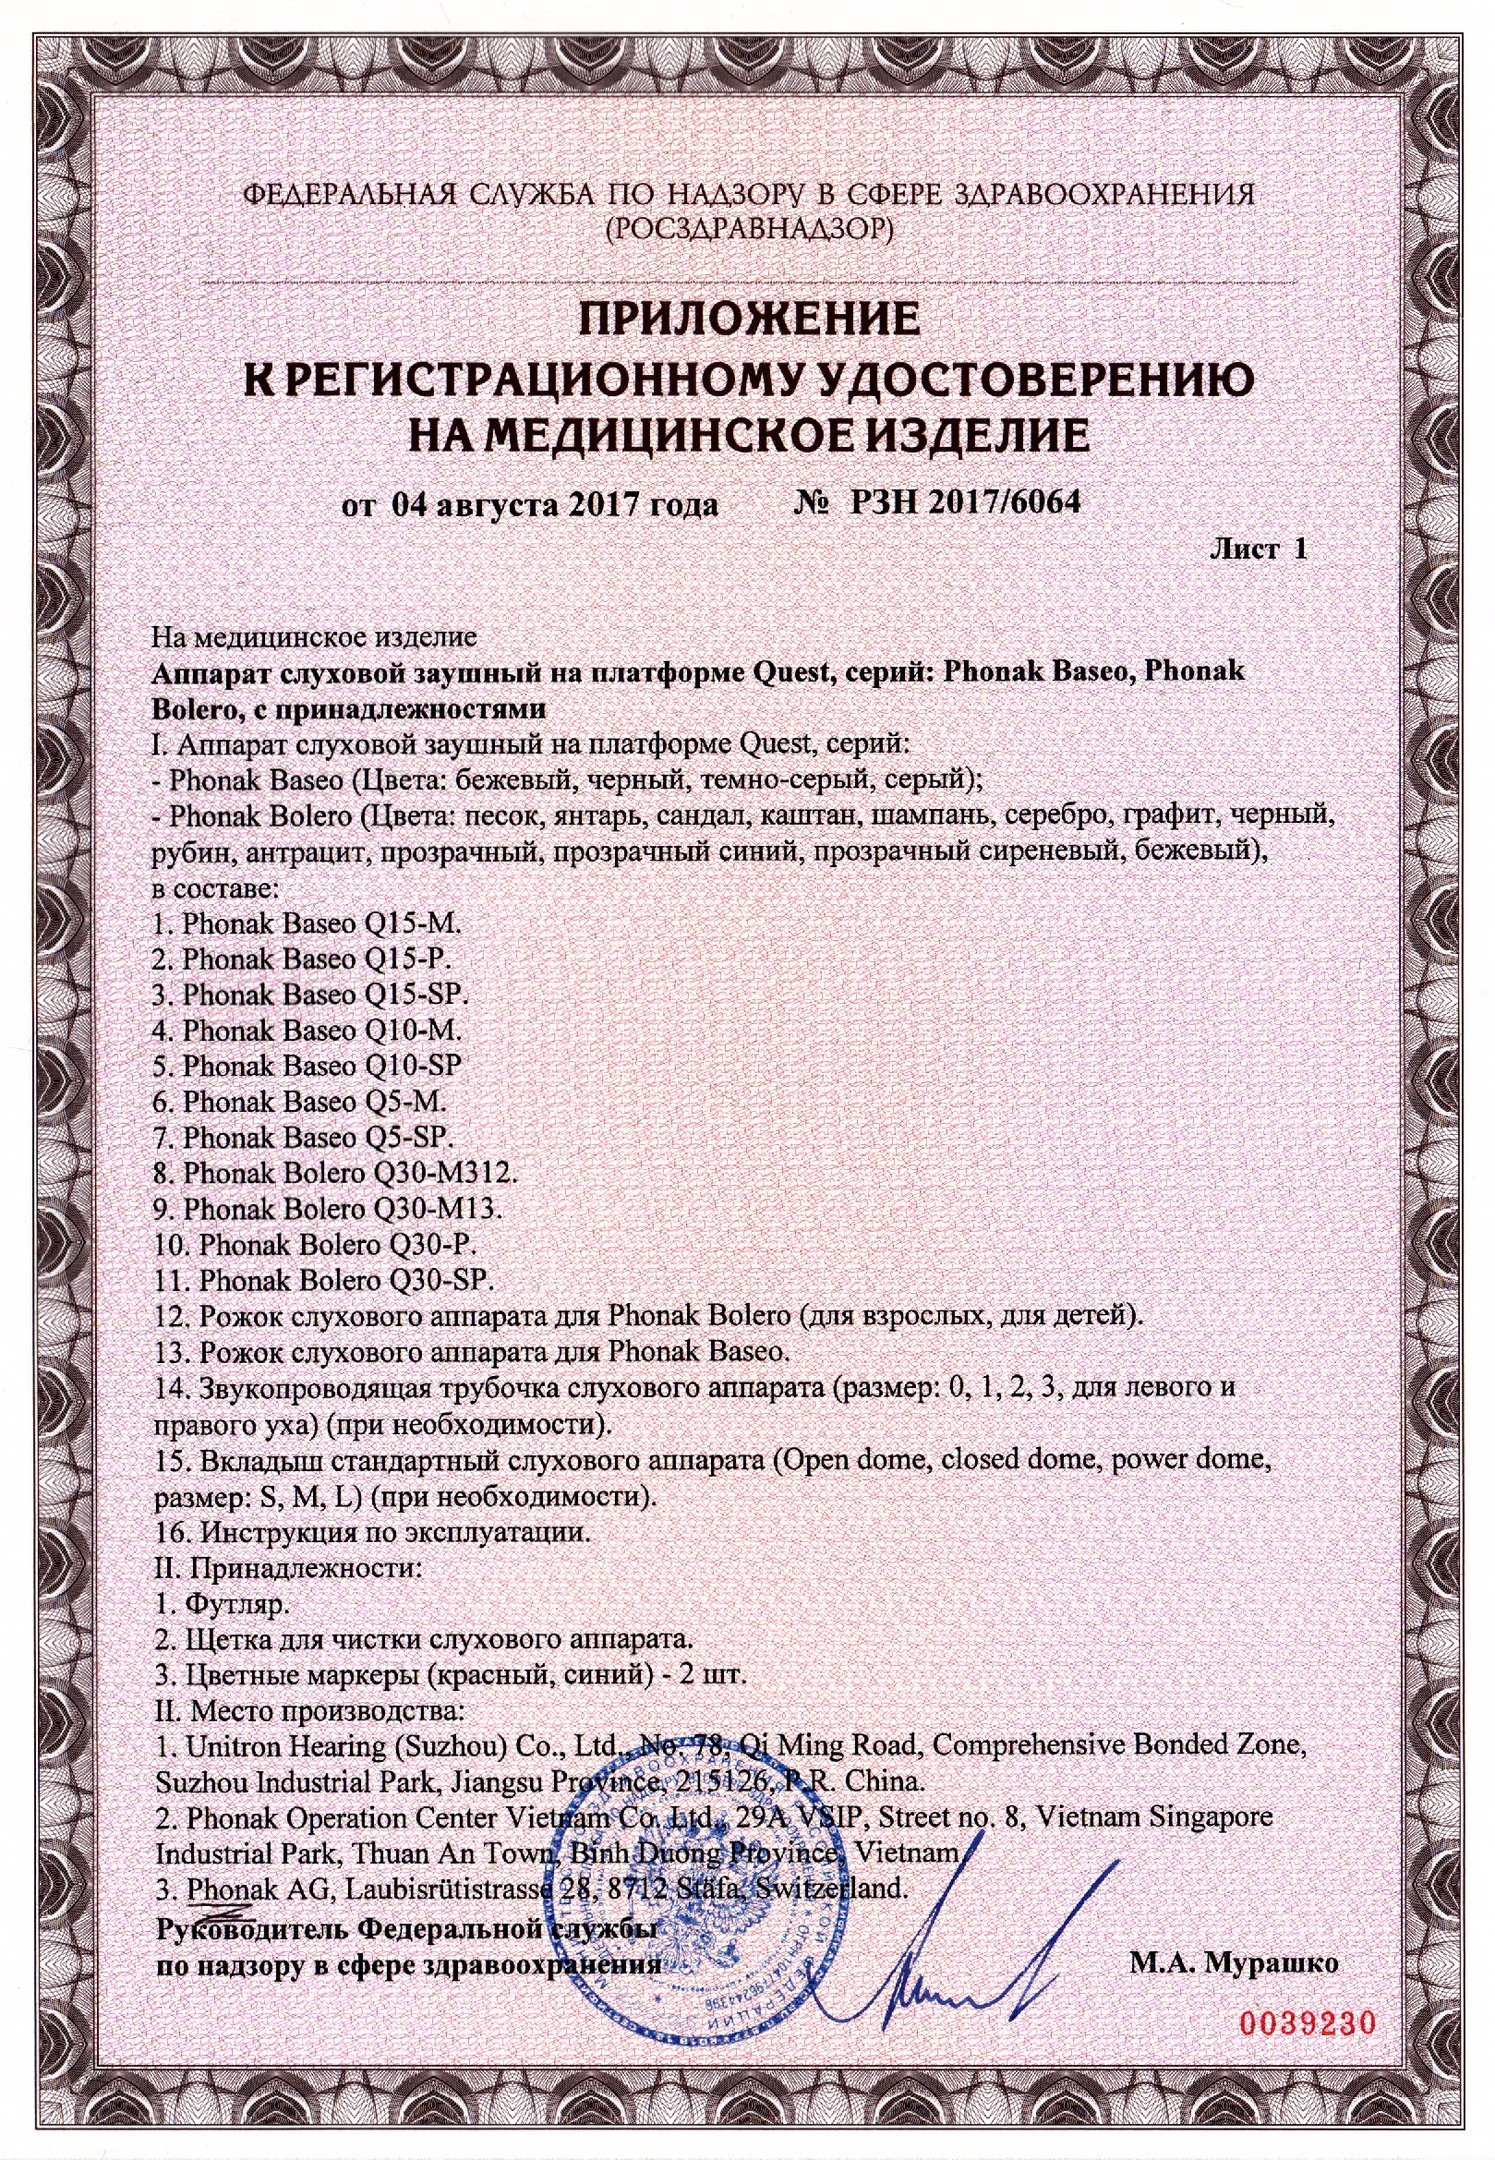 PCKdMoJ0-Zs.jpg?size=1495x2160&quality=96&proxy=1&sign=195746161e4d0ad4c77019bceebfb743&type=album